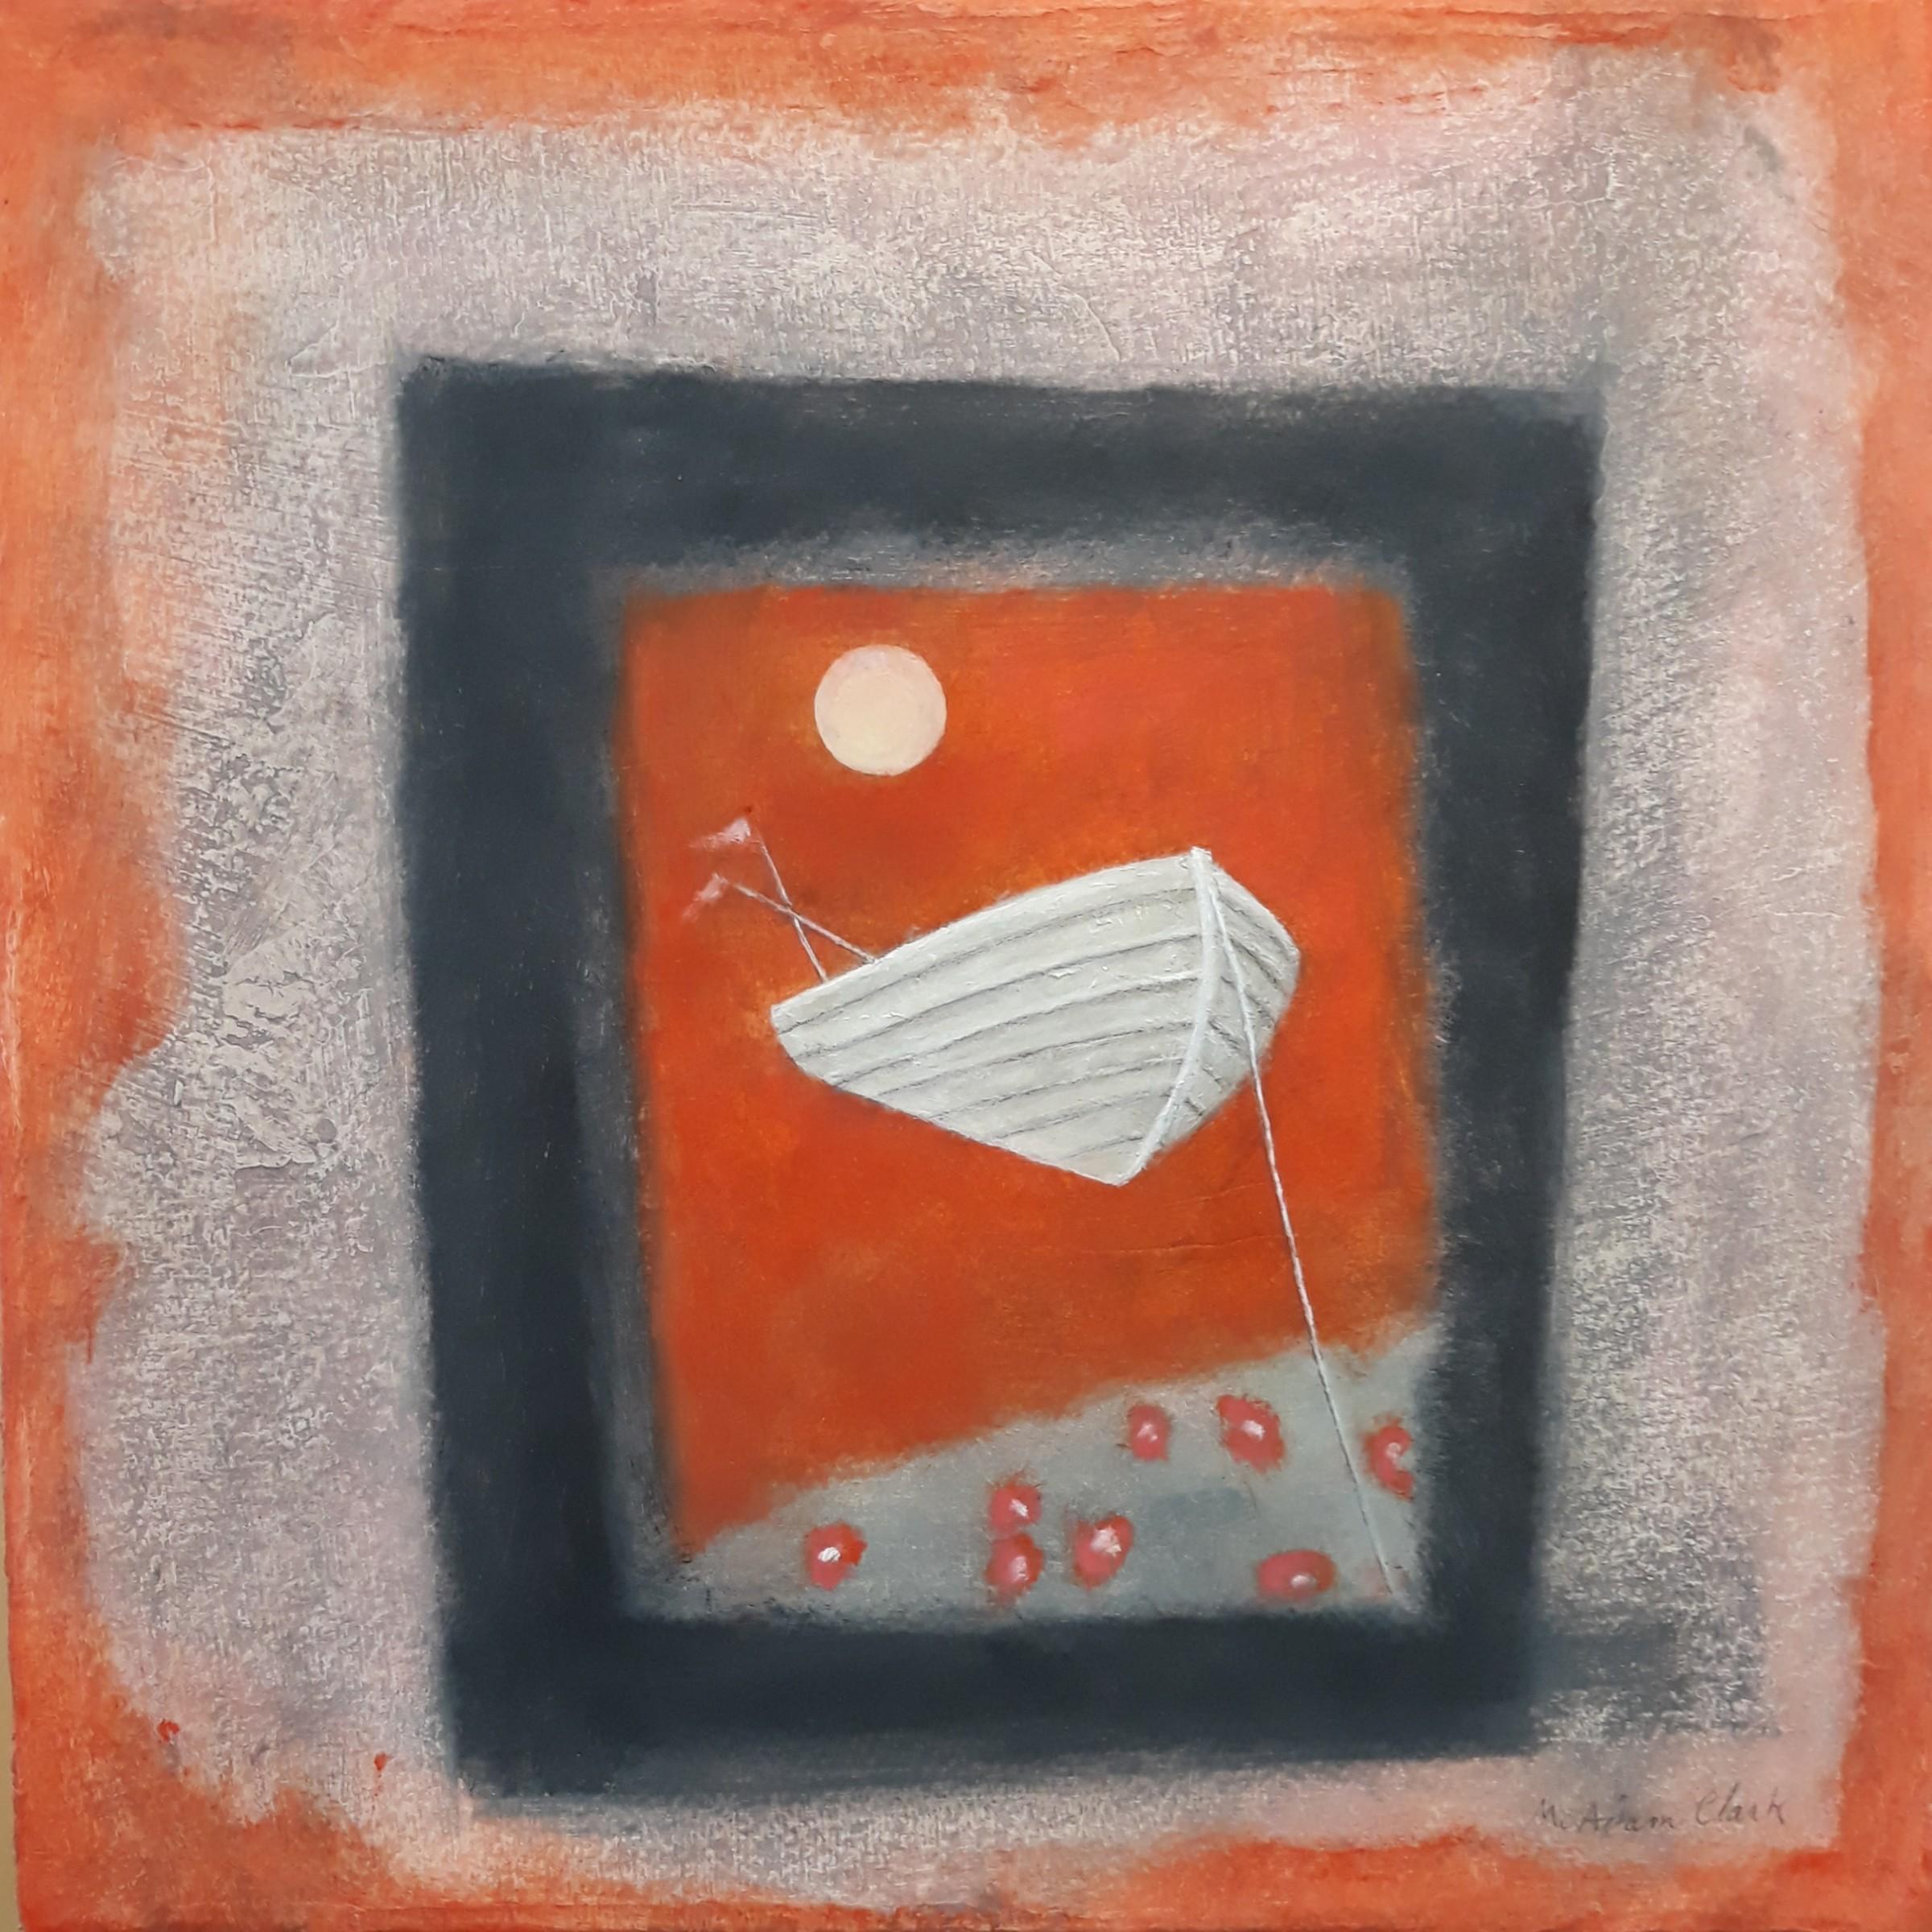 "<span class=""link fancybox-details-link""><a href=""/artists/81-caroline-mcadam-clark/works/12415-caroline-mcadam-clark-ex-voto-fishing-boat/"">View Detail Page</a></span><div class=""artist""><span class=""artist""><strong>Caroline McAdam Clark</strong></span></div><div class=""title""><em>Ex Voto, Fishing Boat</em></div><div class=""medium"">oil on canvas</div><div class=""dimensions"">Frame: 40 x 40 cm<br /> Artwork: 30 x 30 cm</div><div class=""price"">£850.00</div>"